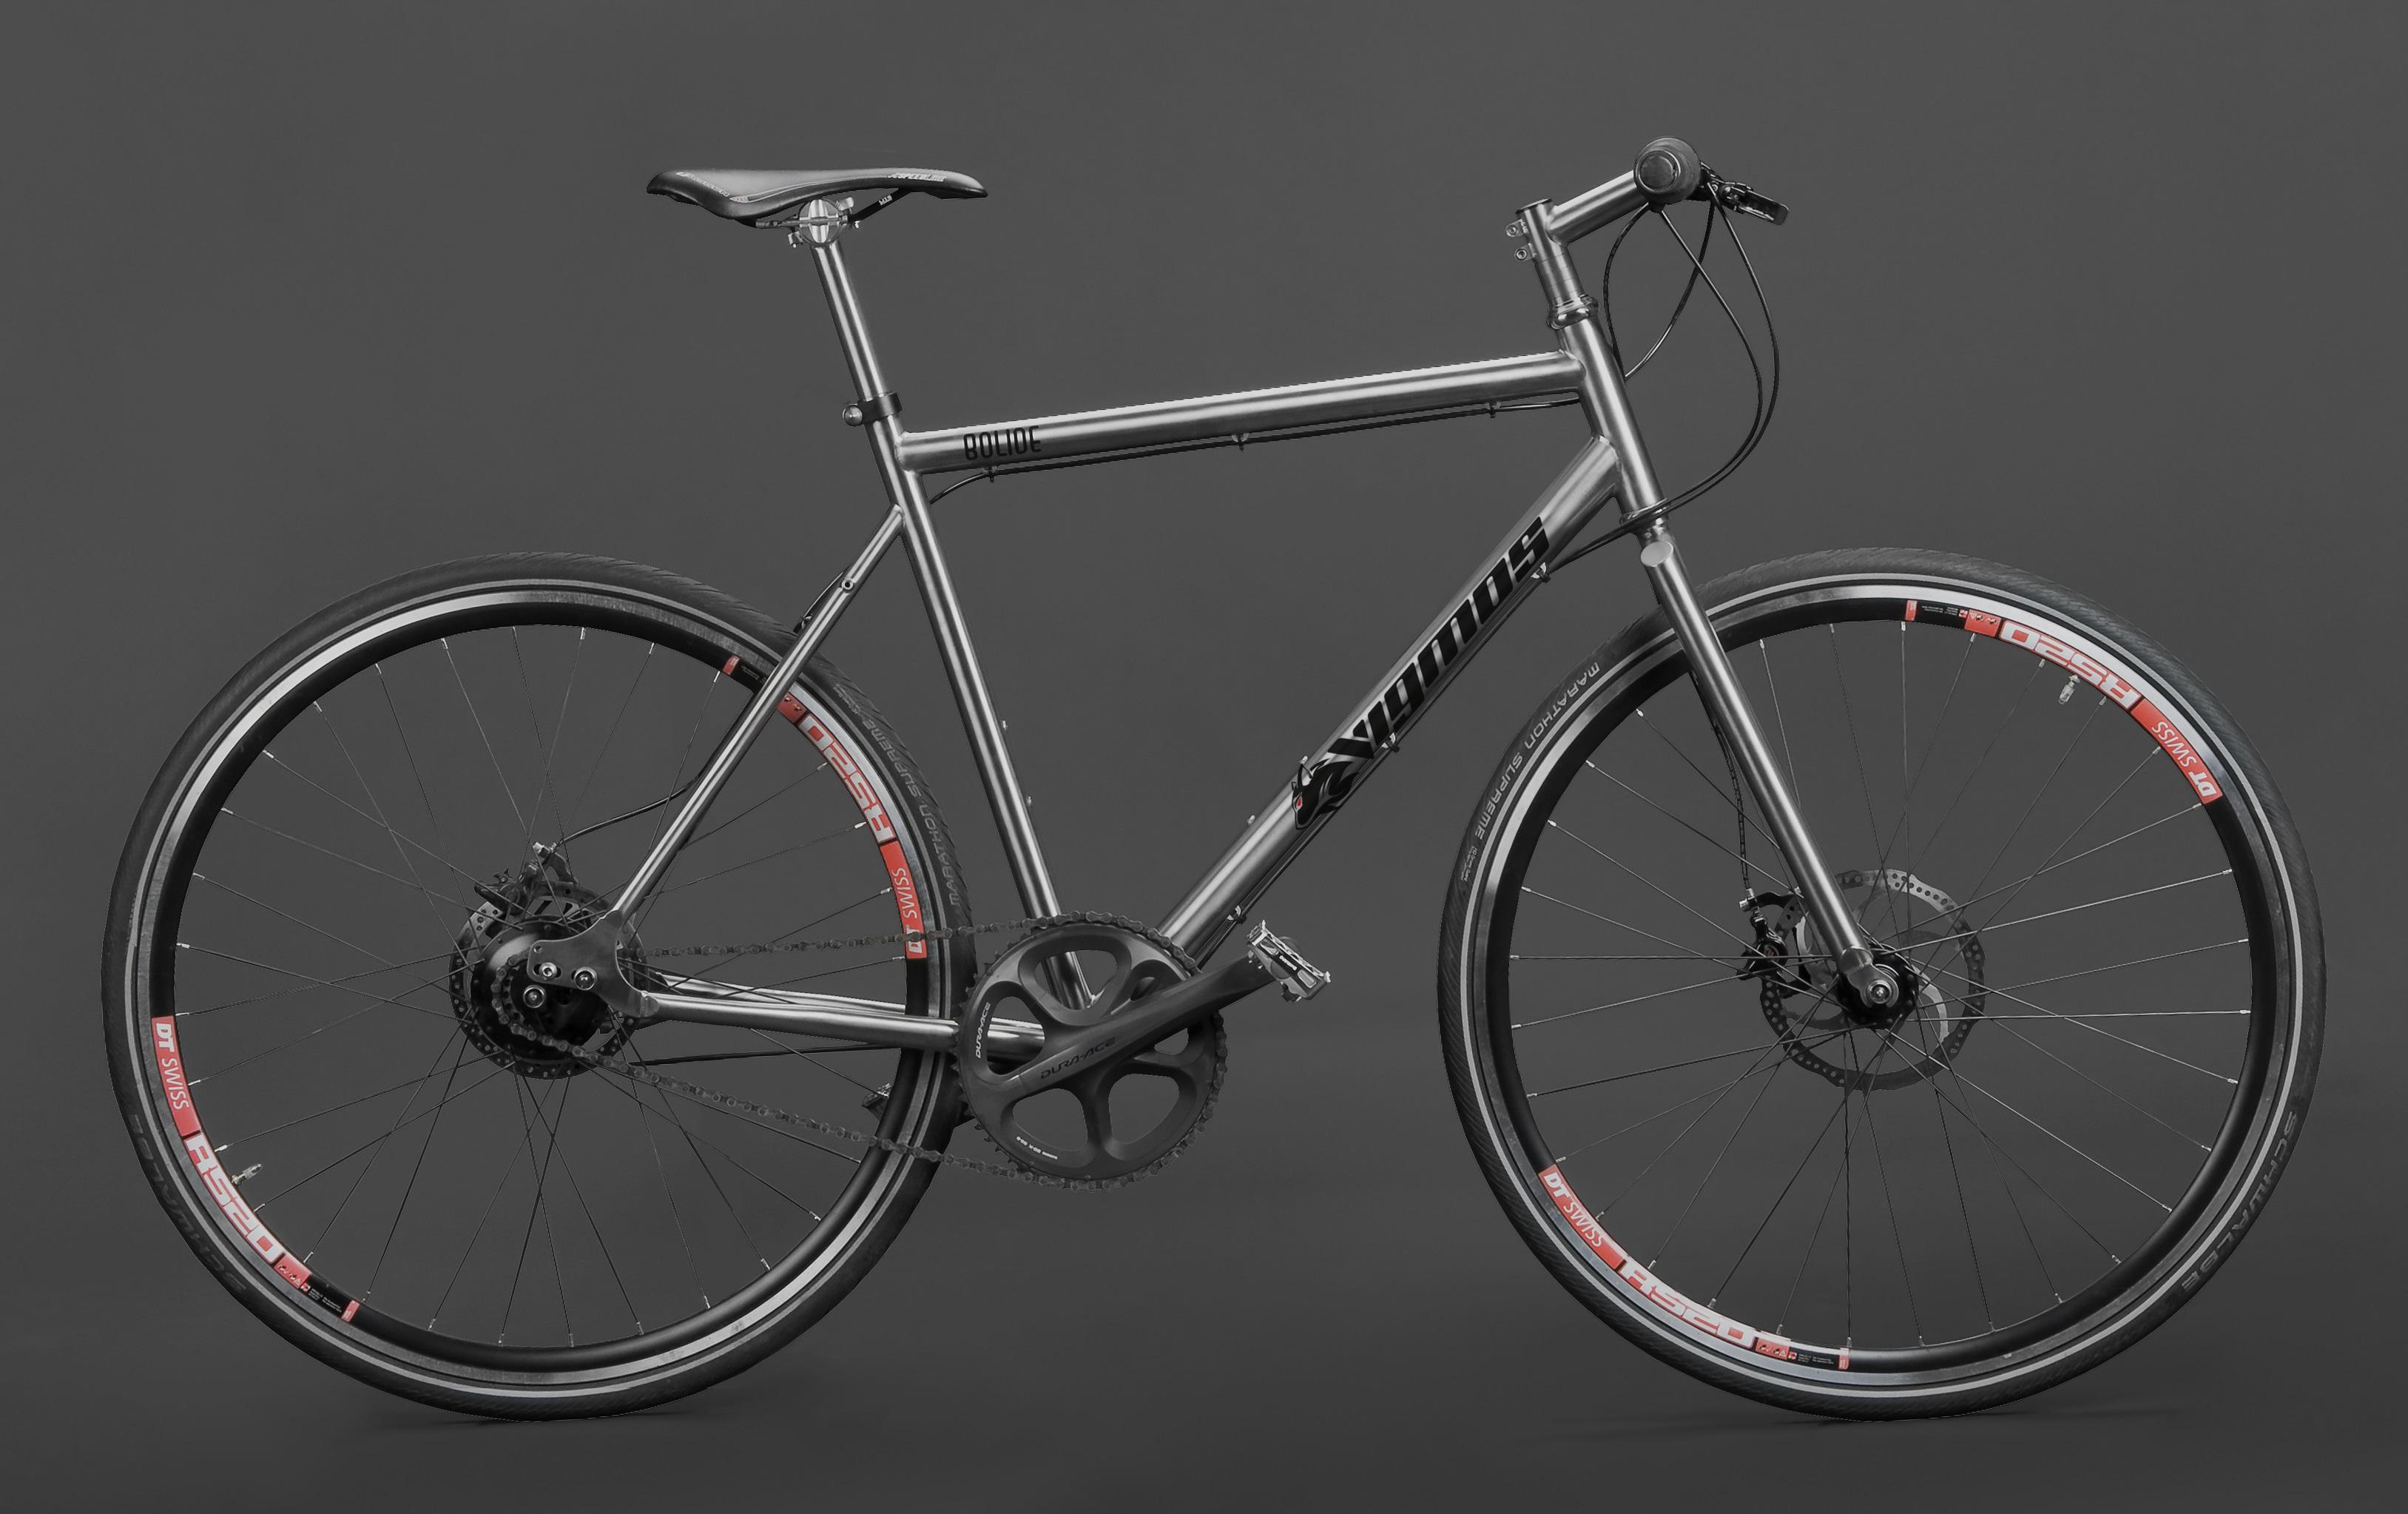 Titan Rohloff Trekking Rad - Individueller Fahrradbau - Titanteile